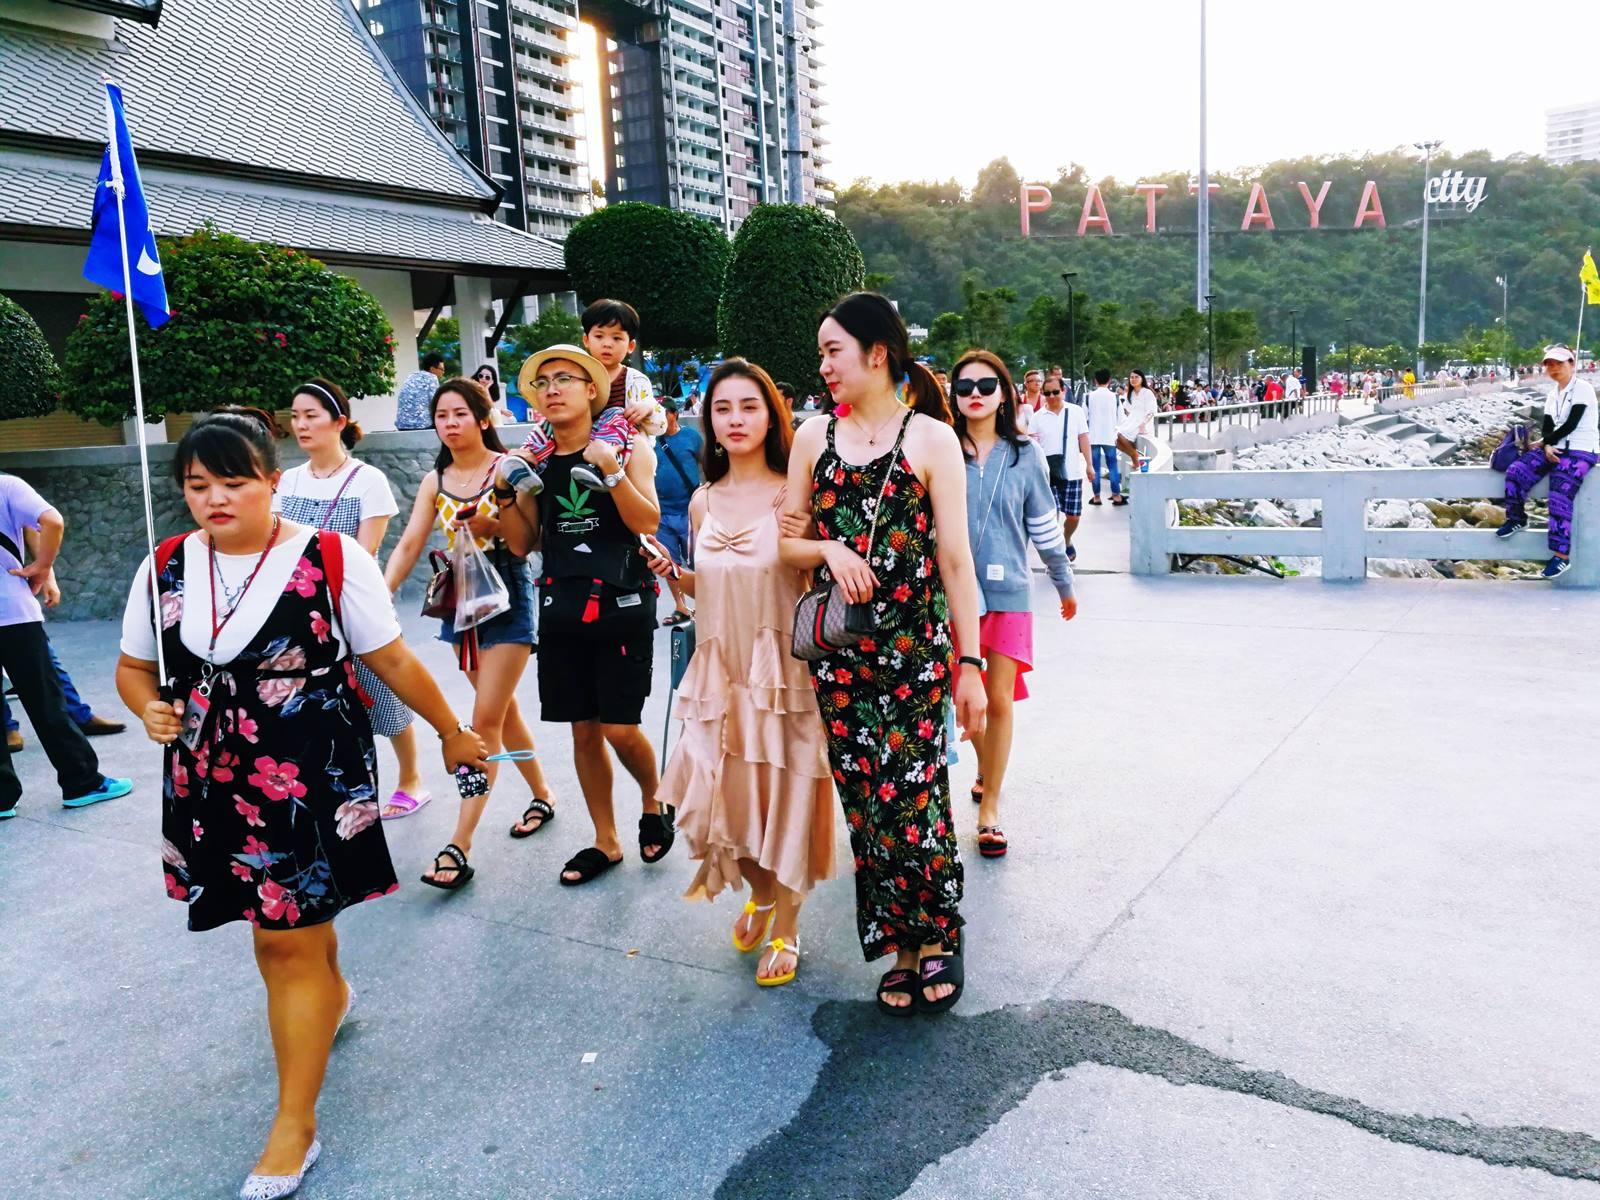 Thailand extends Free visa-on-arrival until 30 April 2019